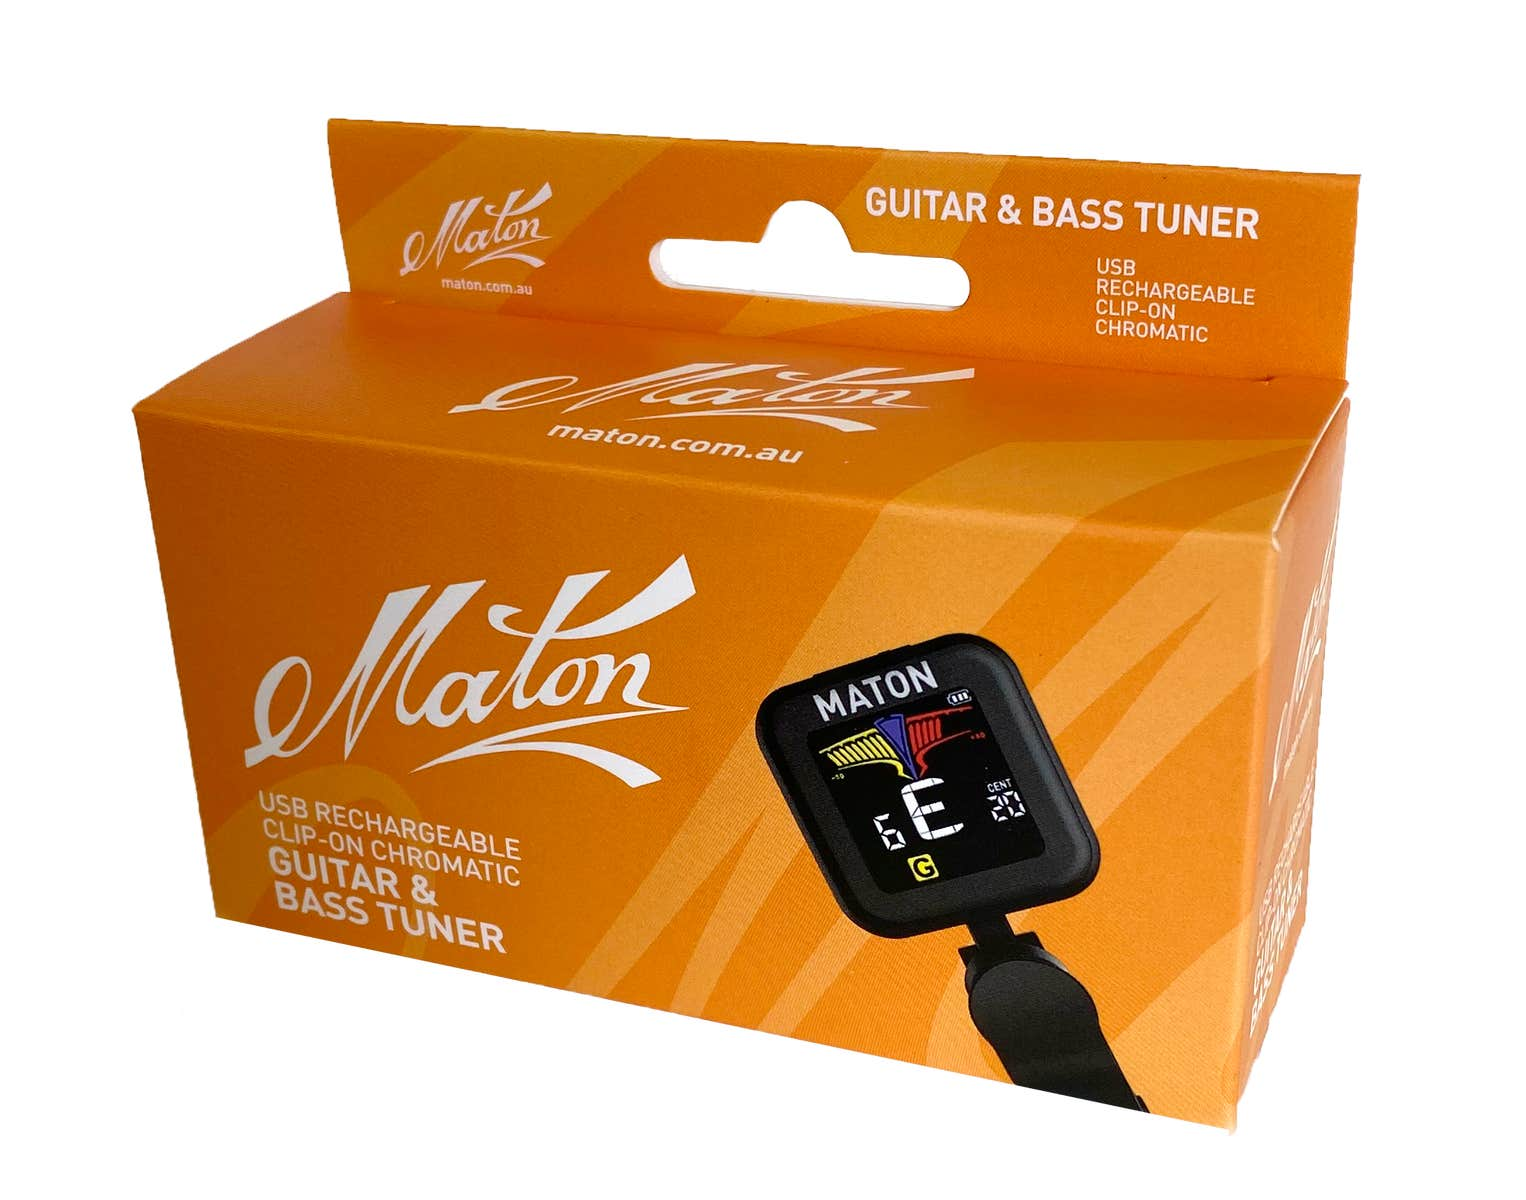 Maton USB Rechargable Clip-on Guitar + Bass Tuner